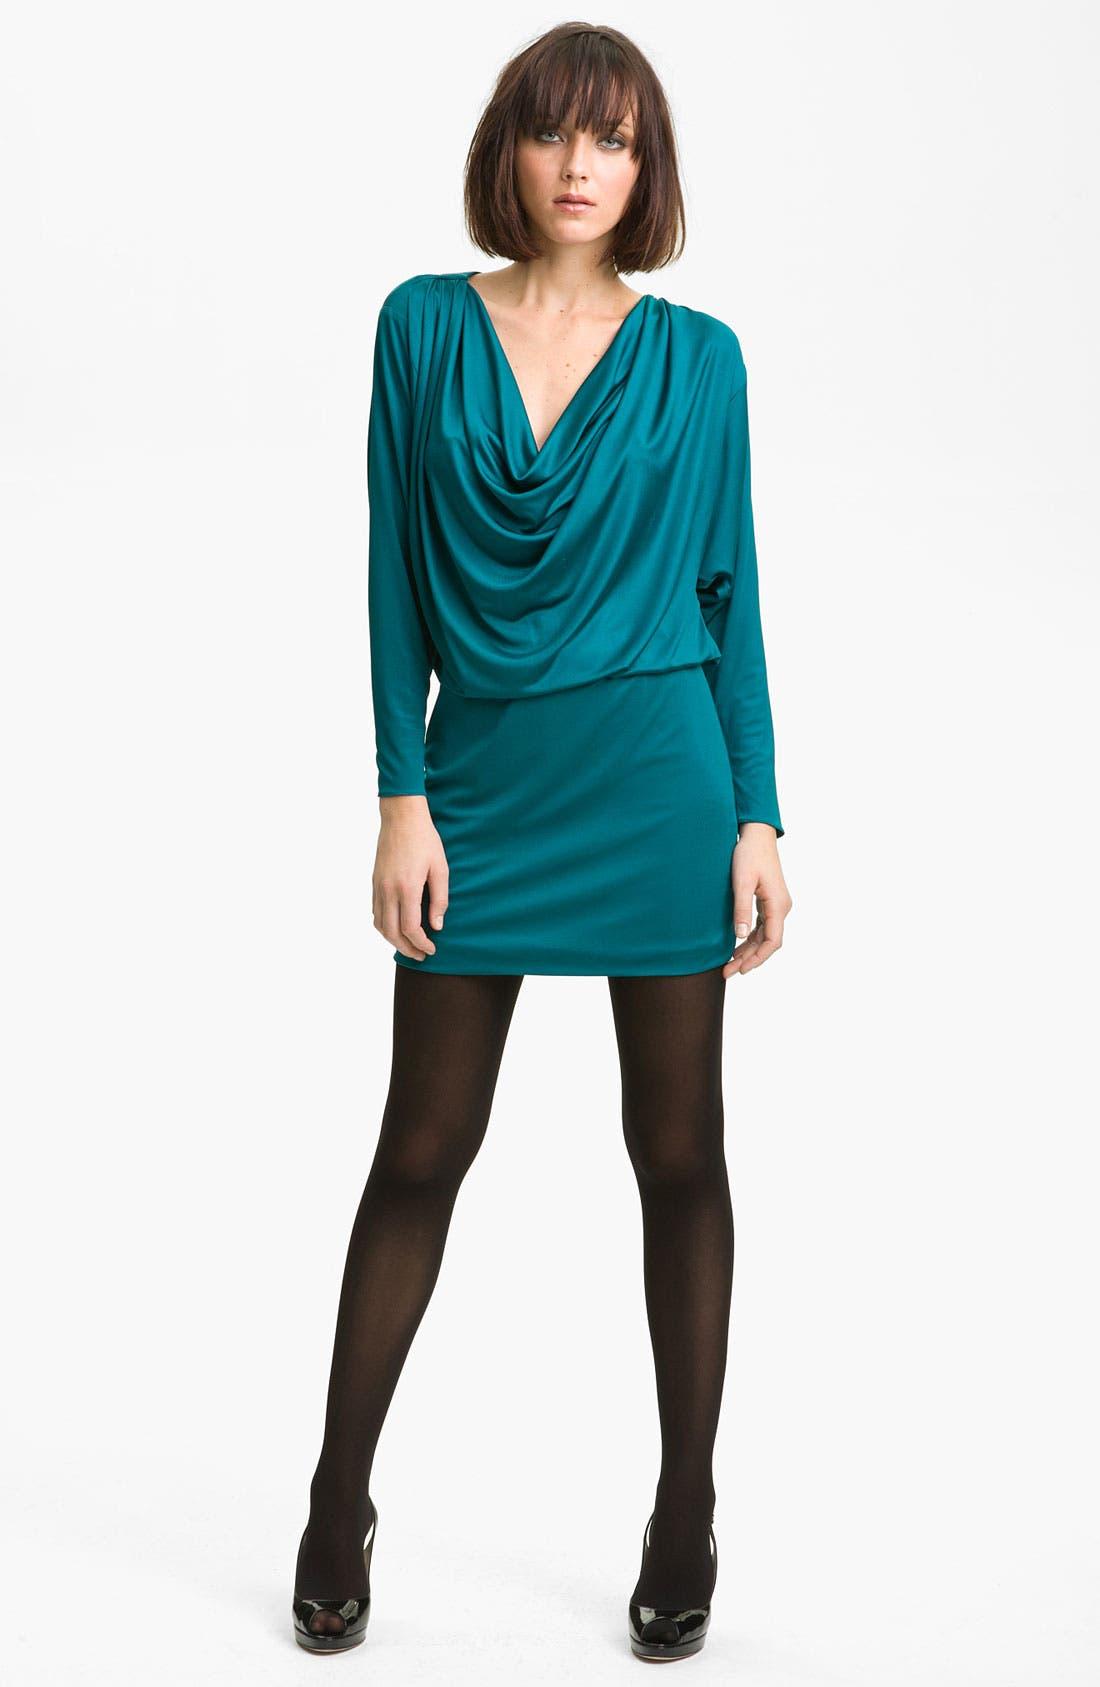 Alternate Image 1 Selected - Jay Godfrey 'Linden' Draped Jersey Dress